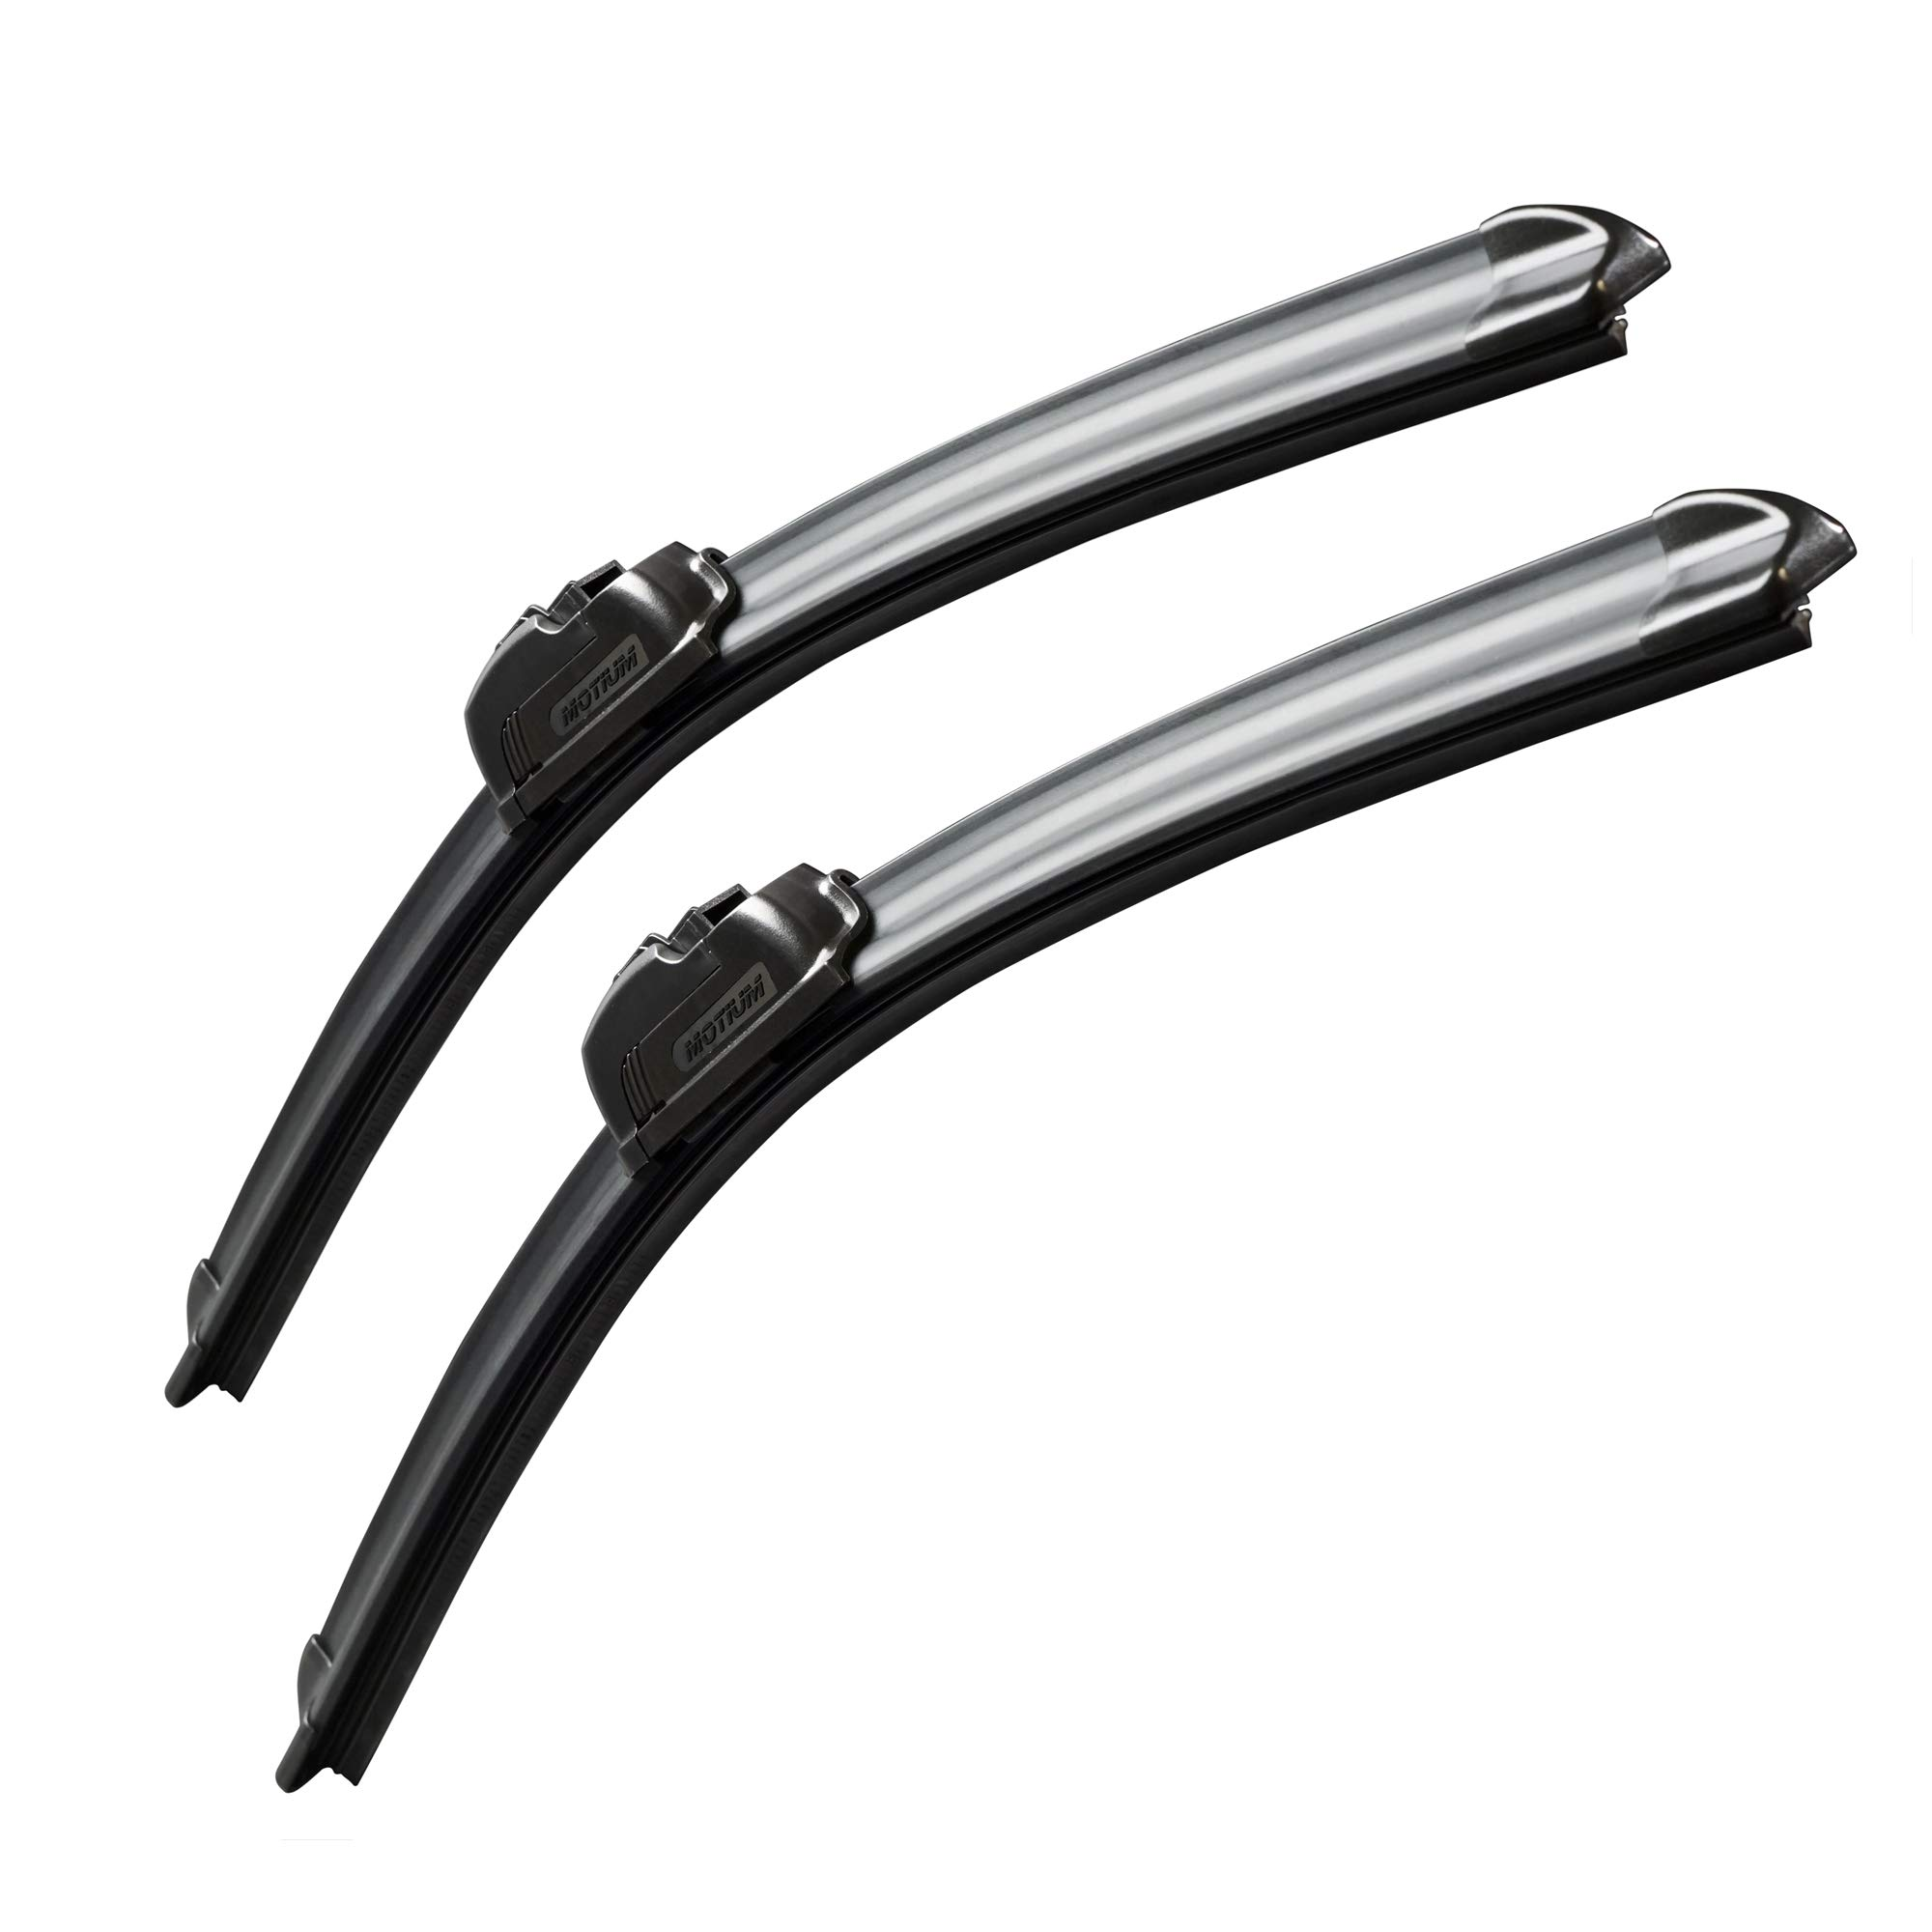 "MOTIUM OEM QUALITY 26"" + 20"" Premium All-Season Windshield Wiper Blades,1 Year Warranty(Set of 2)…"